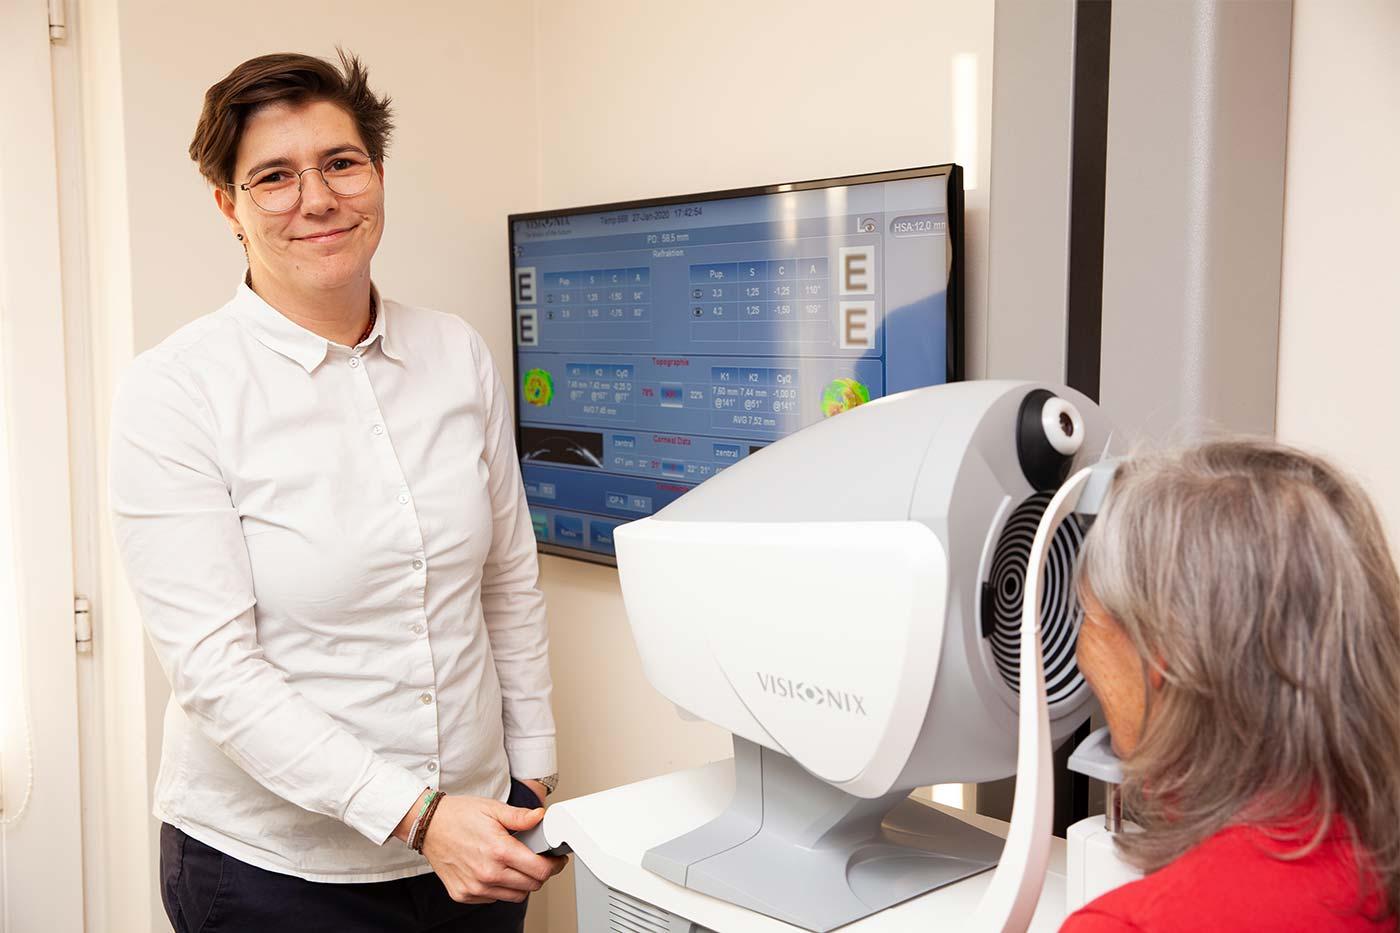 Augenoptikerin Julia Seibel - Kontaktlinsen-Profi